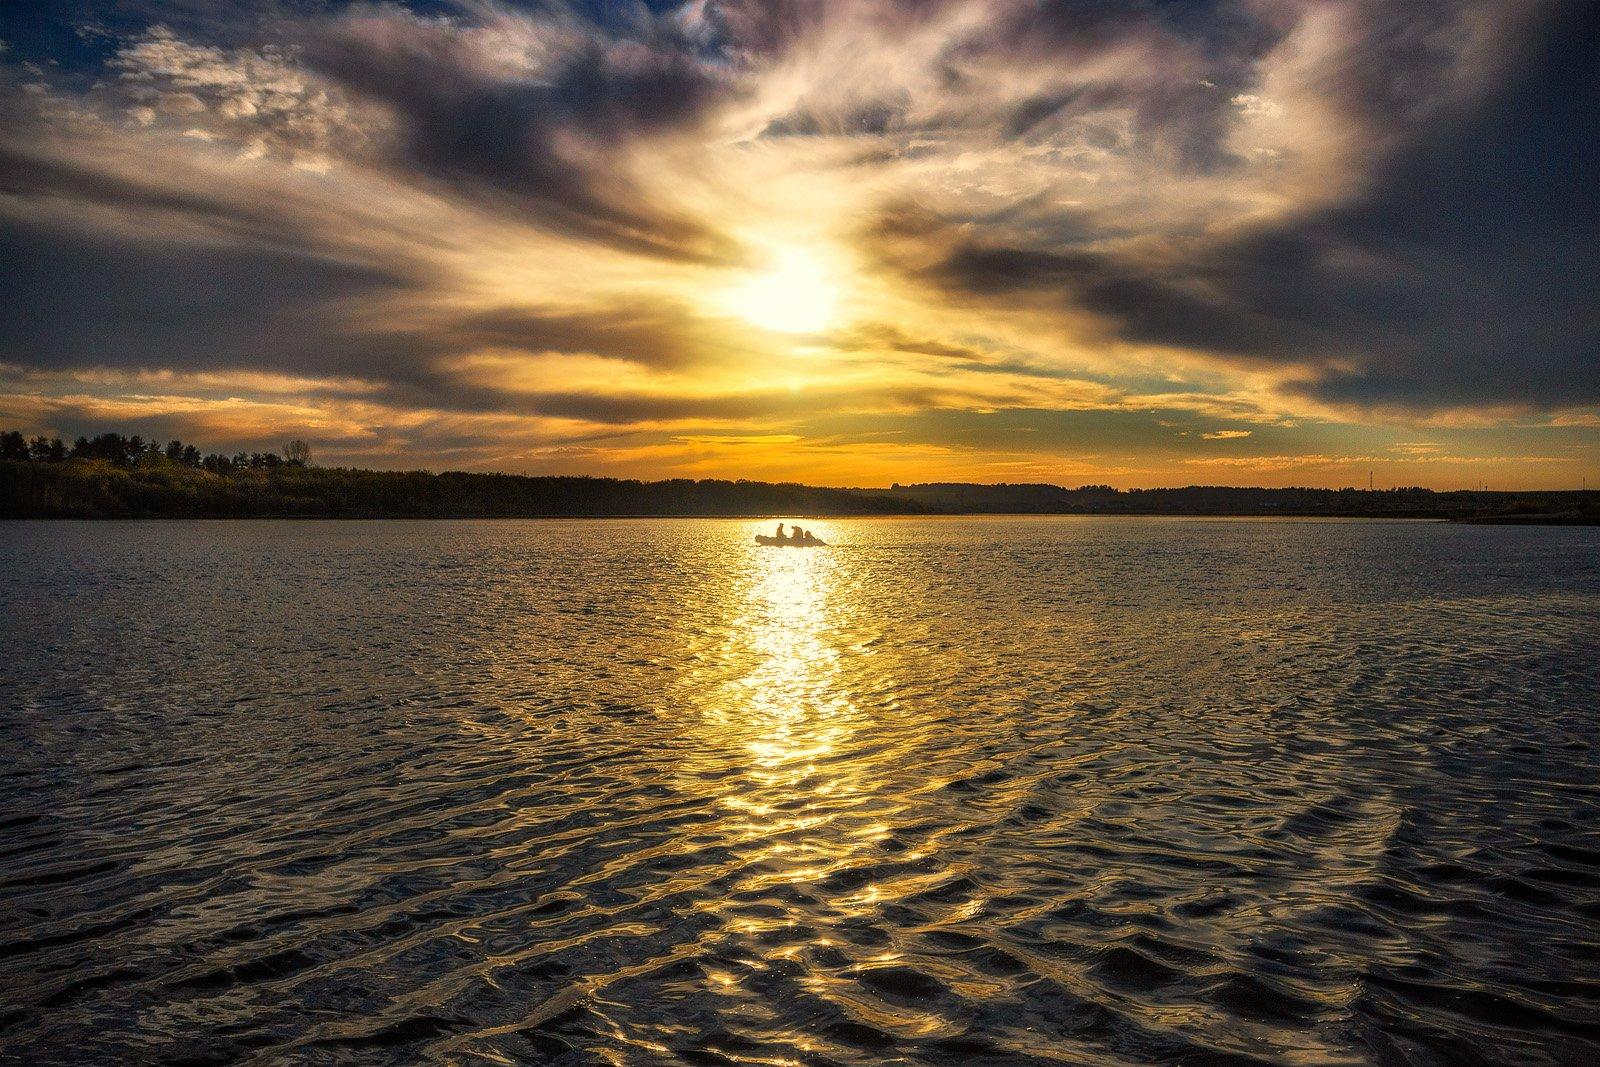 закат, осень, река, небо, облака, отражение, солнце, Пушкарев Николай